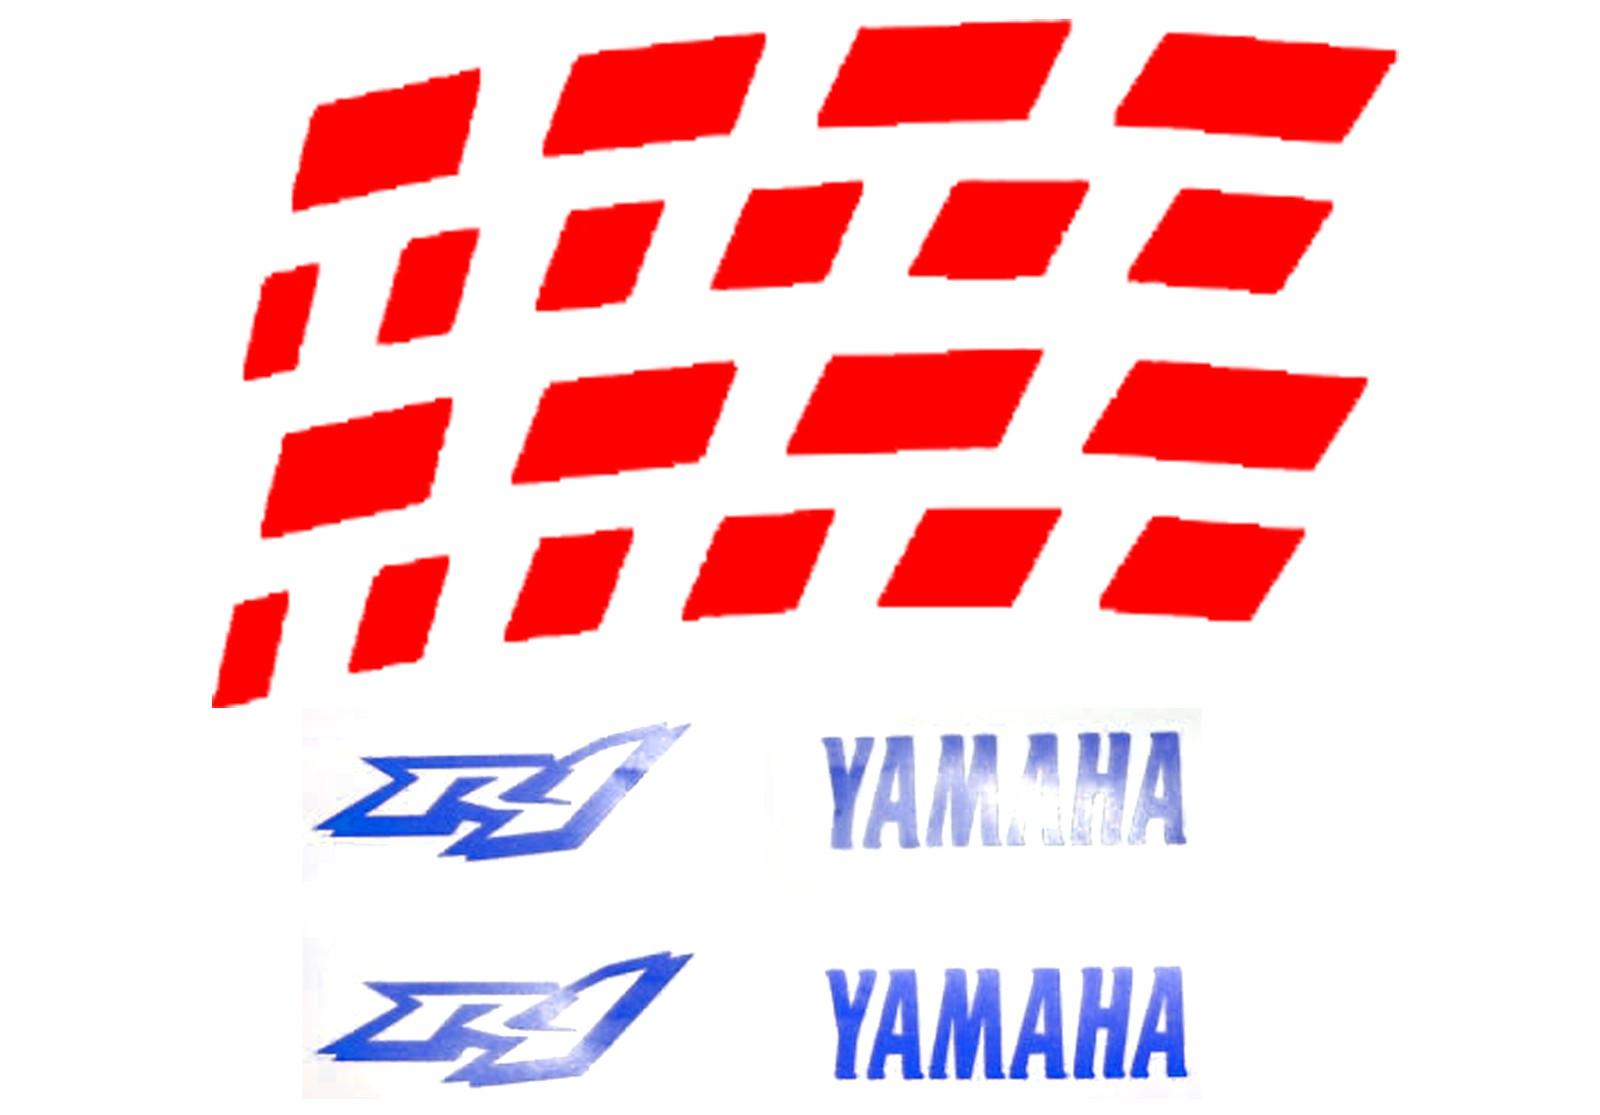 Zweifarbige Felgenbettaufkleber Yamaha YZF R1